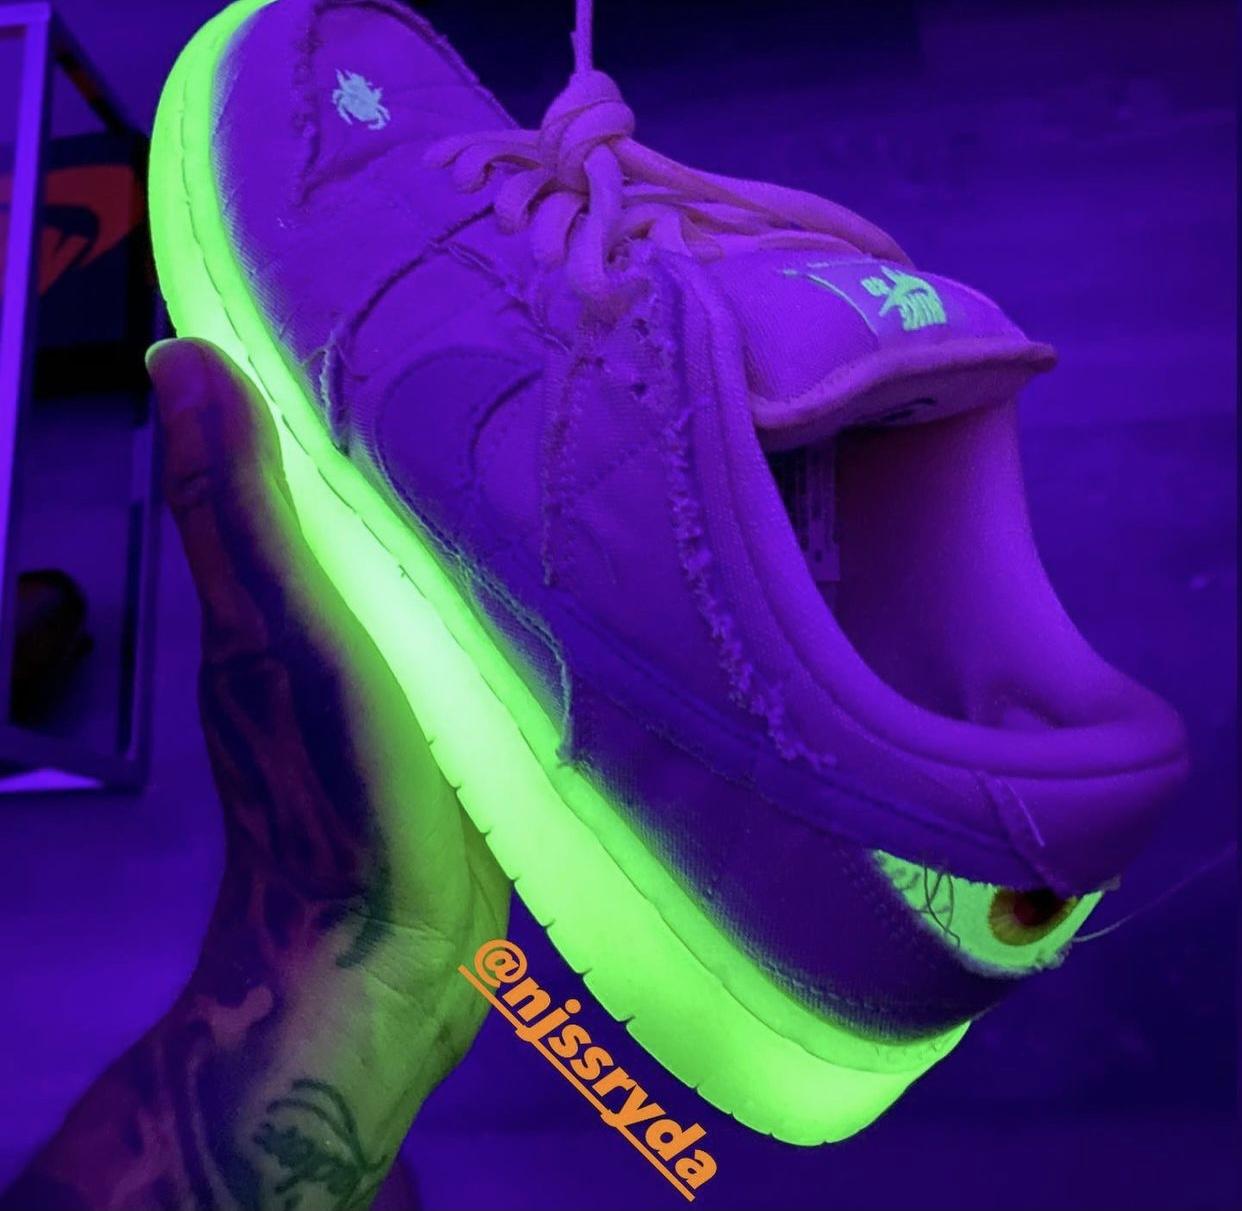 Save big + get 3 months free! Nike SB Dunk Low Mummy Halloween 2021 DM0774-111 Release Date - SBD